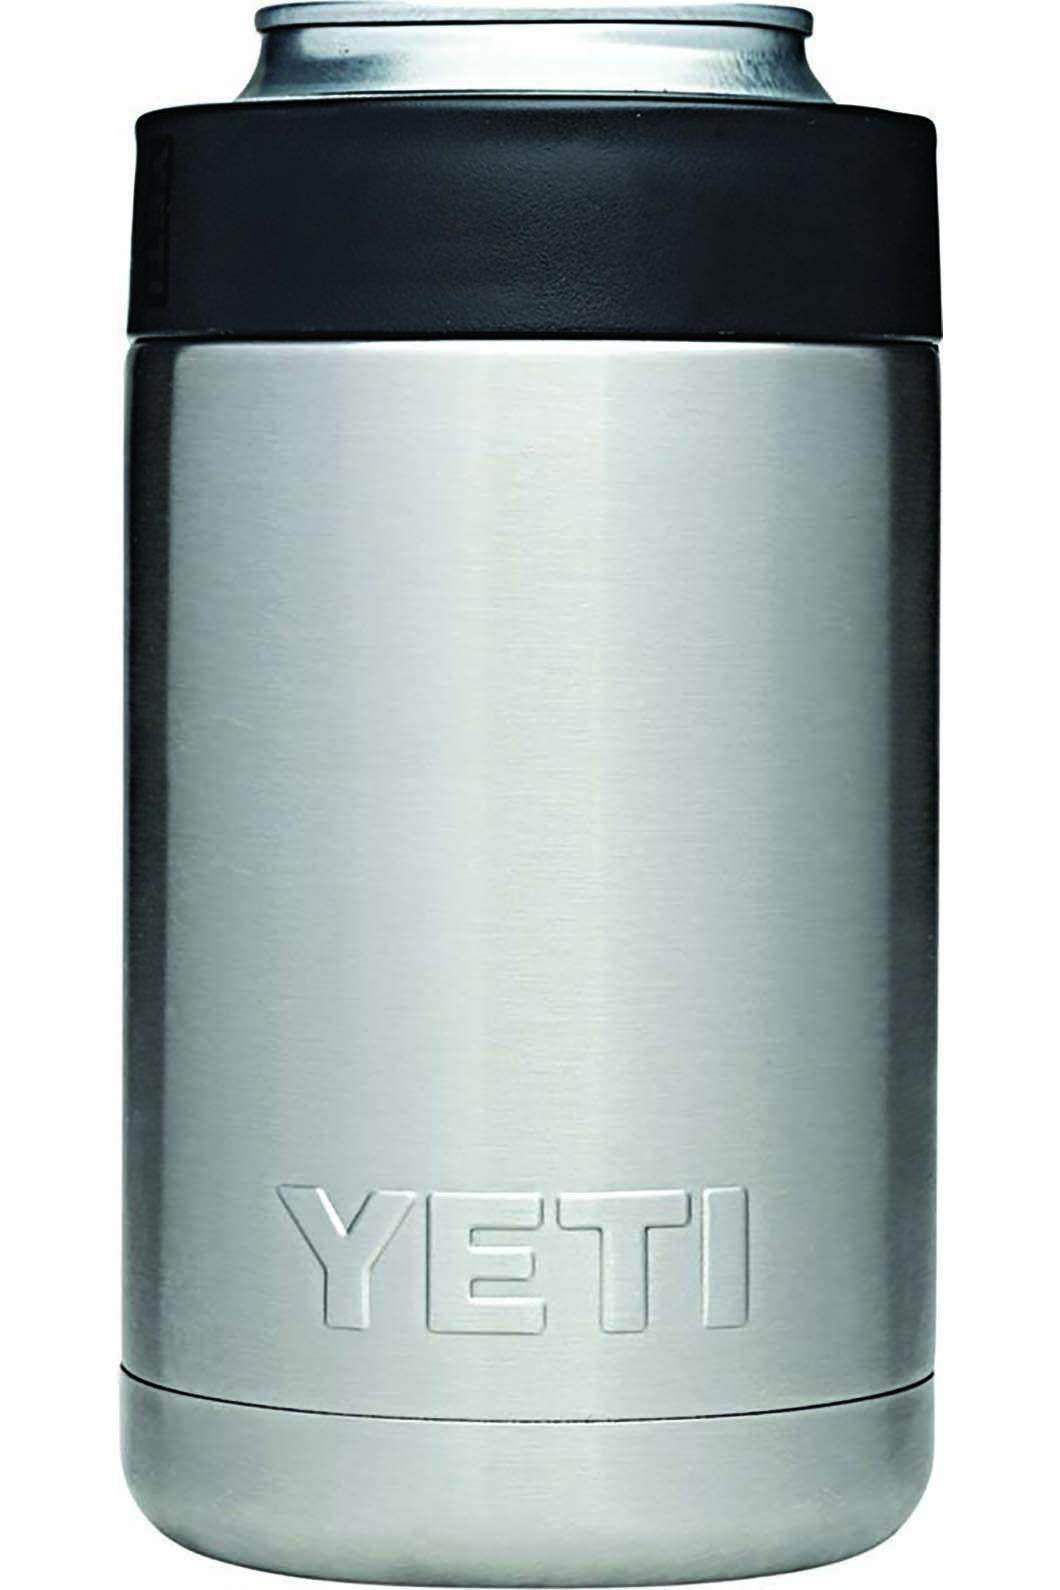 Yeti Rambler Colster Drink Holder, None, hi-res